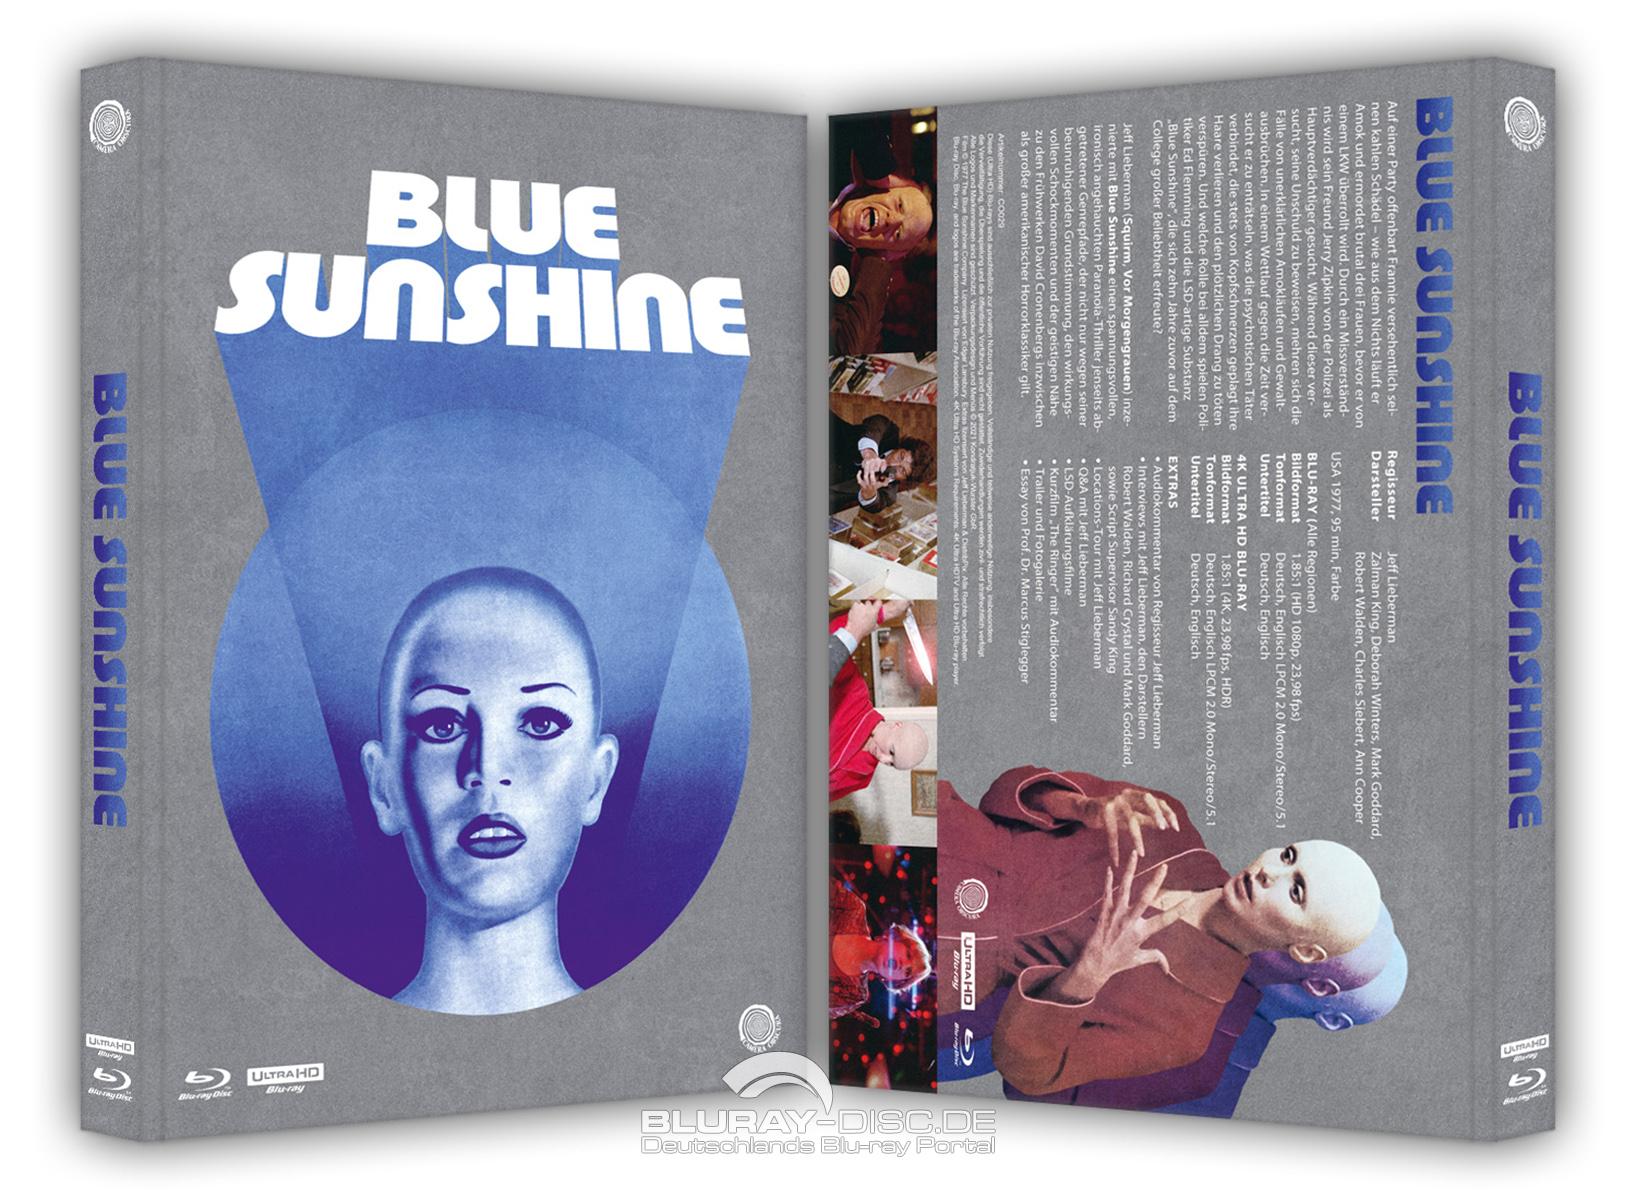 Blue_Sunshine_Galerie_4K_Mediabook_Cover_A.jpg